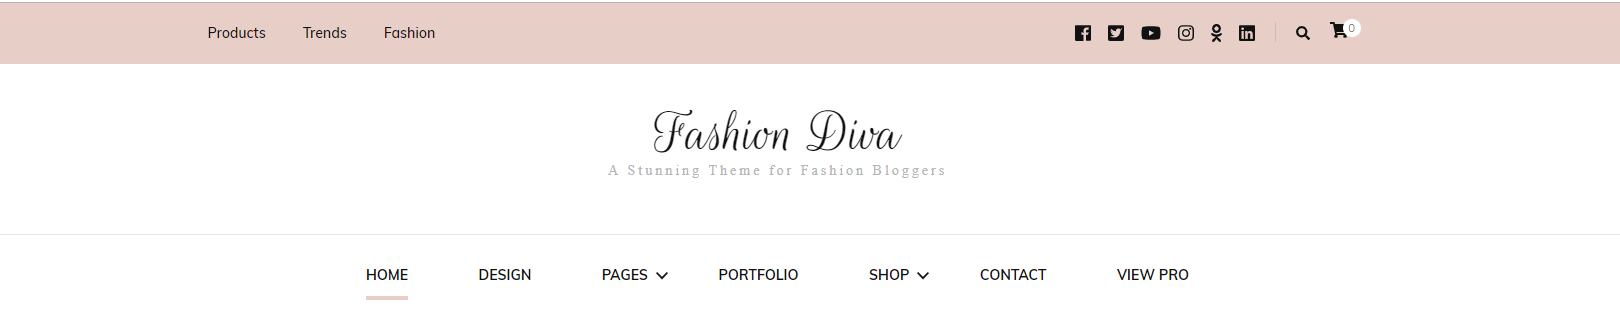 Header section fashion diva